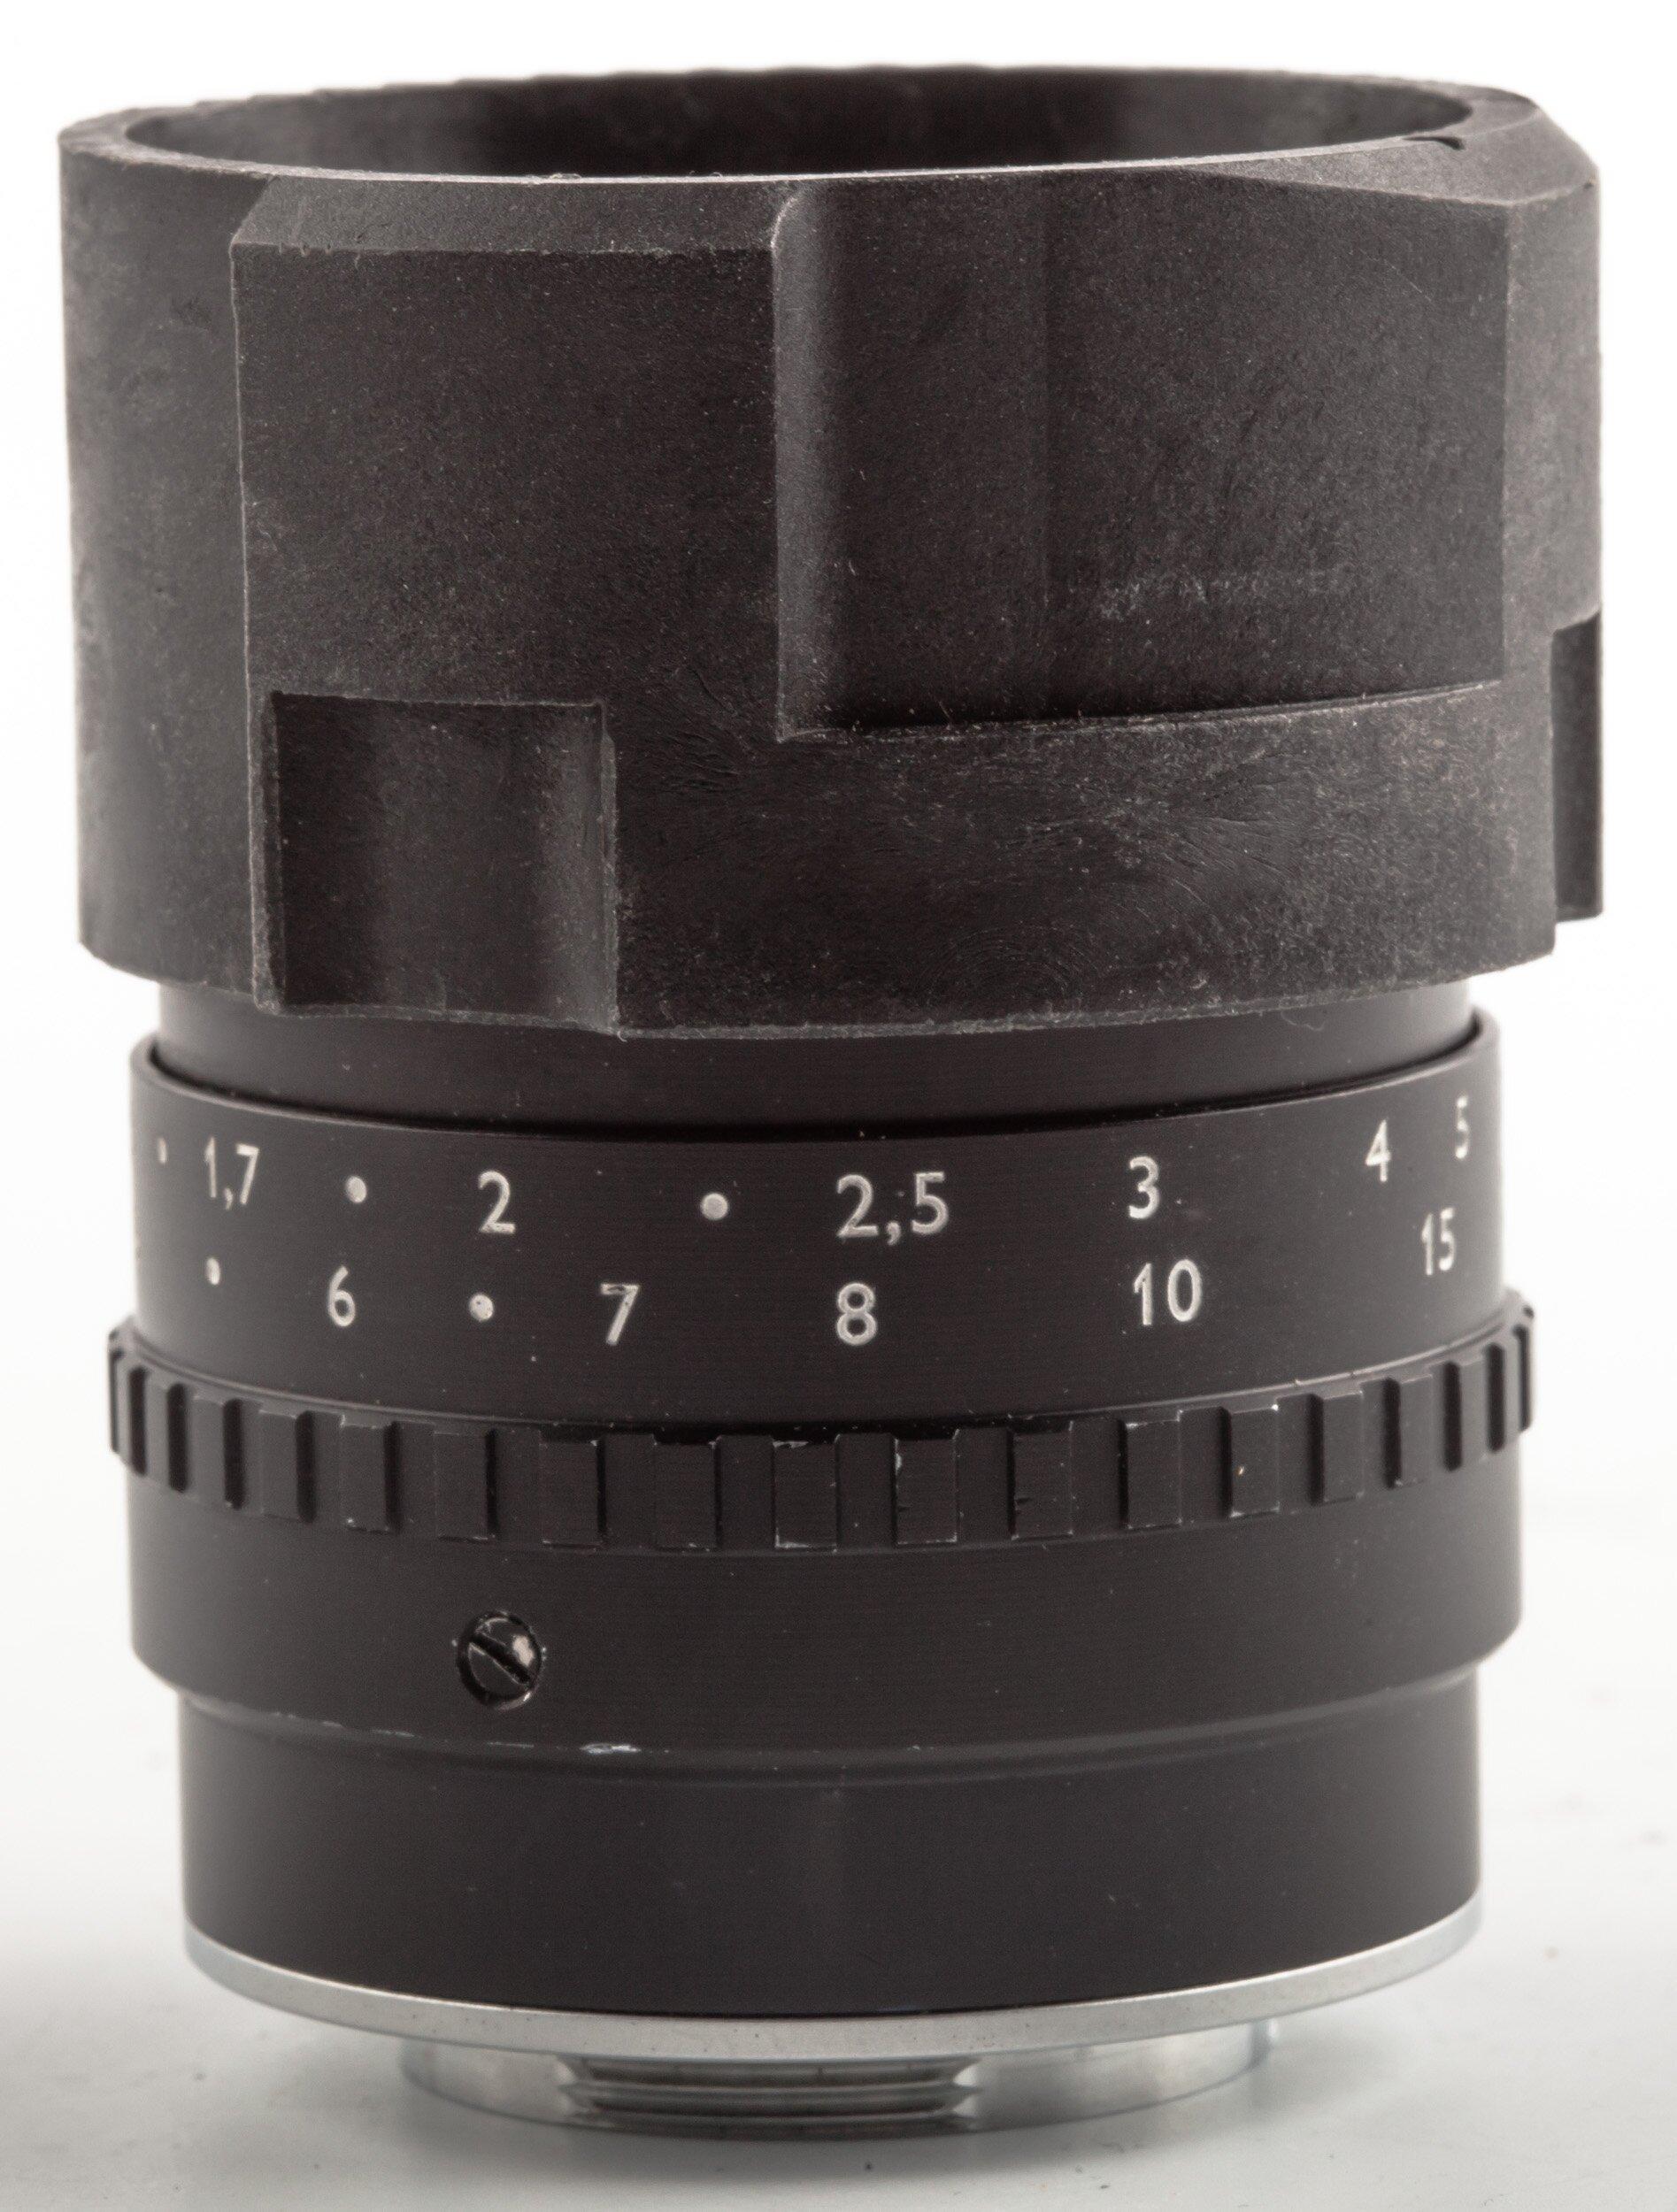 Schneider Tele-Xenar 3,8/90mm Robot Royal